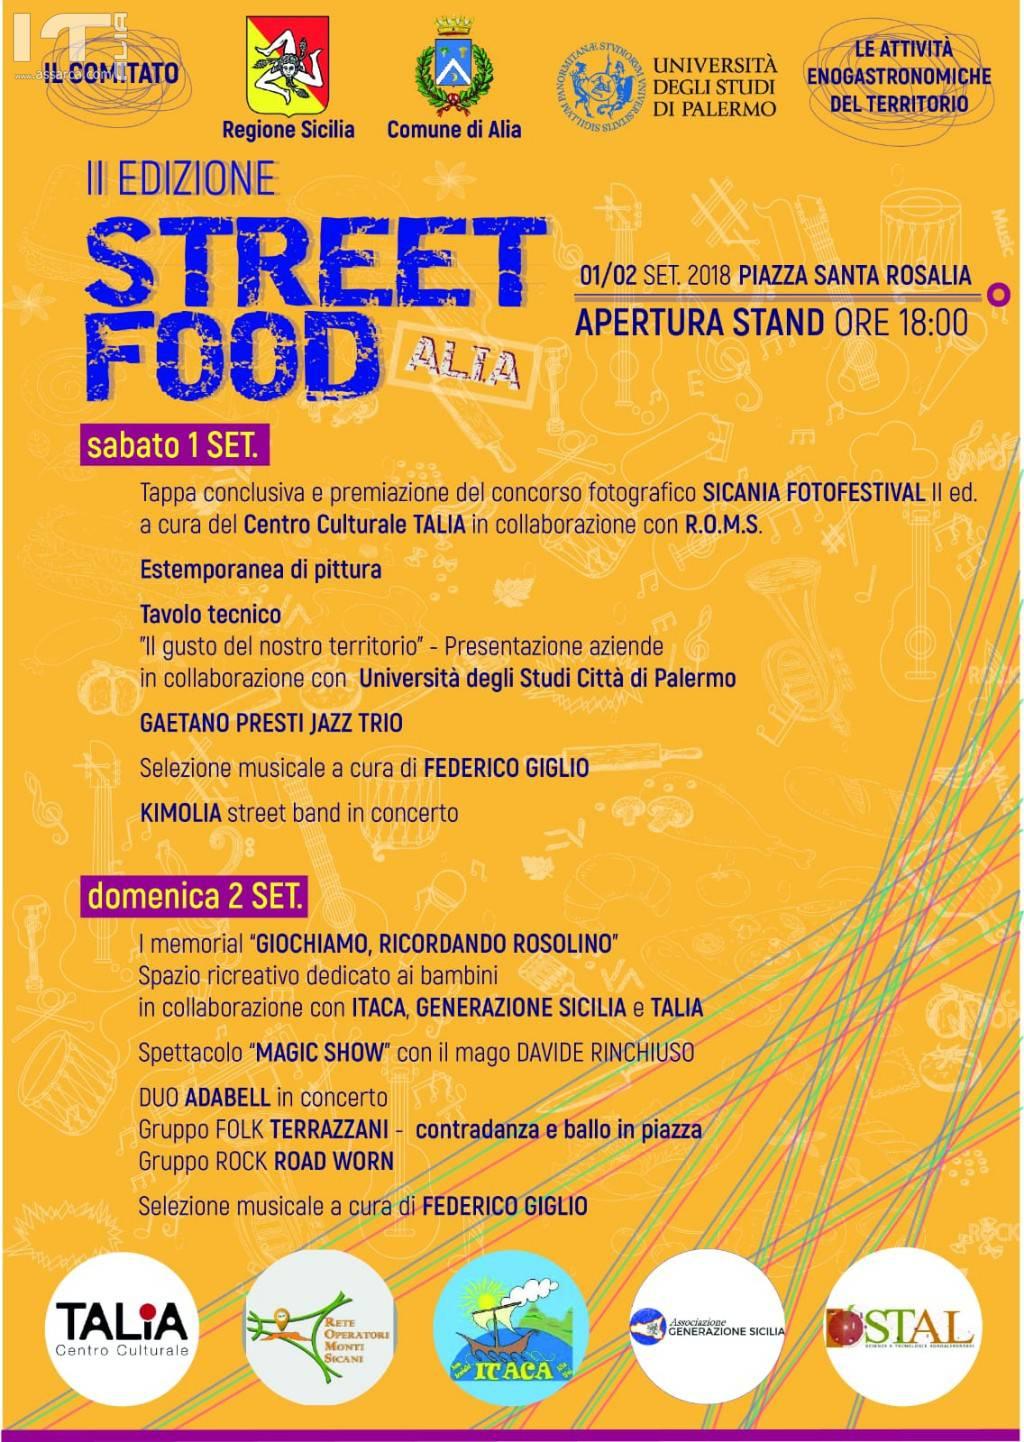 II EDIZIONE STREET FOOD